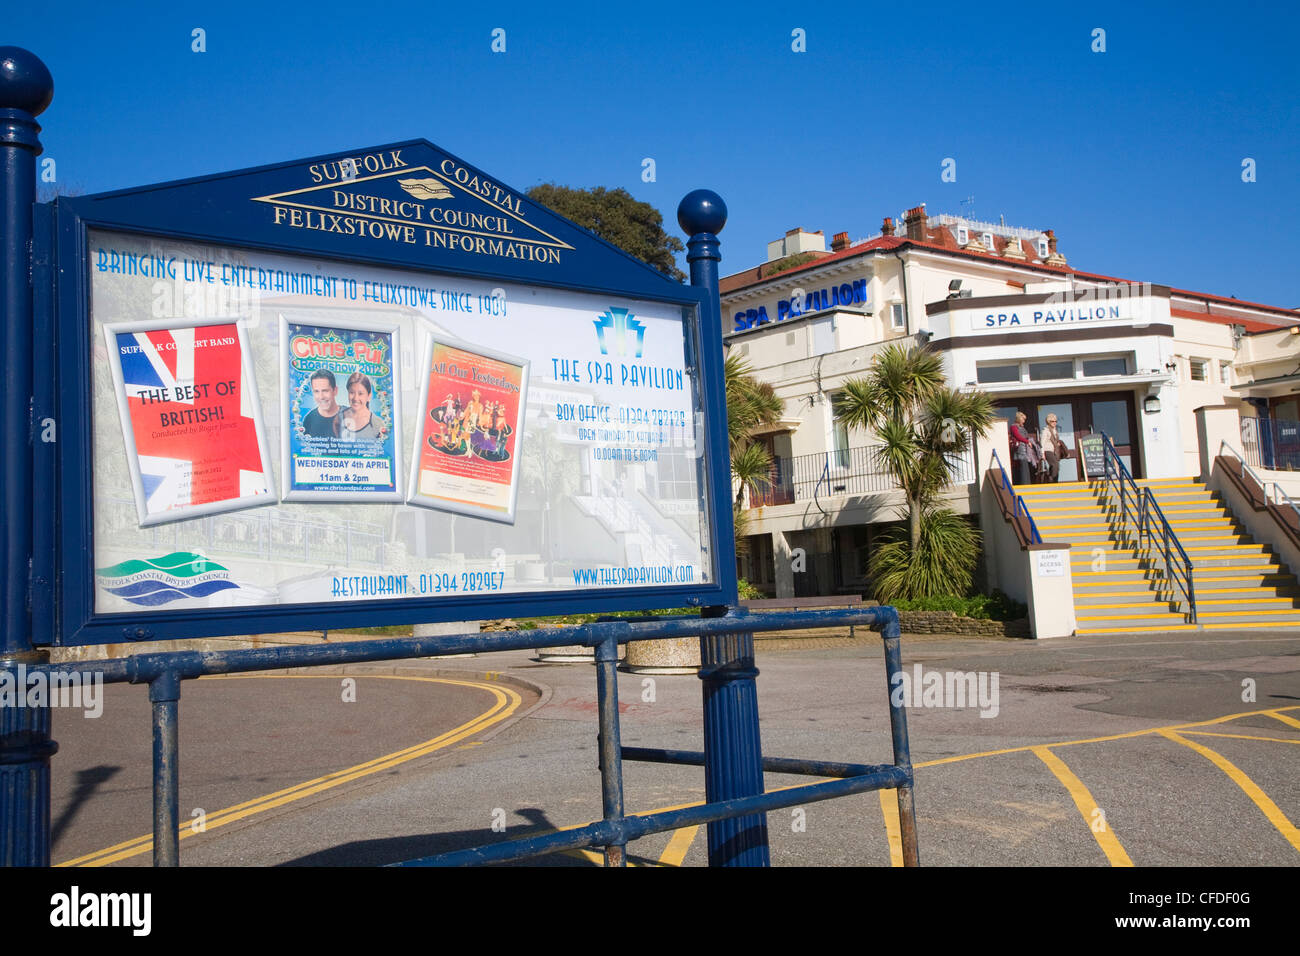 Tourist information noticeboard Spa Pavilion, Felixstowe, Suffolk, England - Stock Image